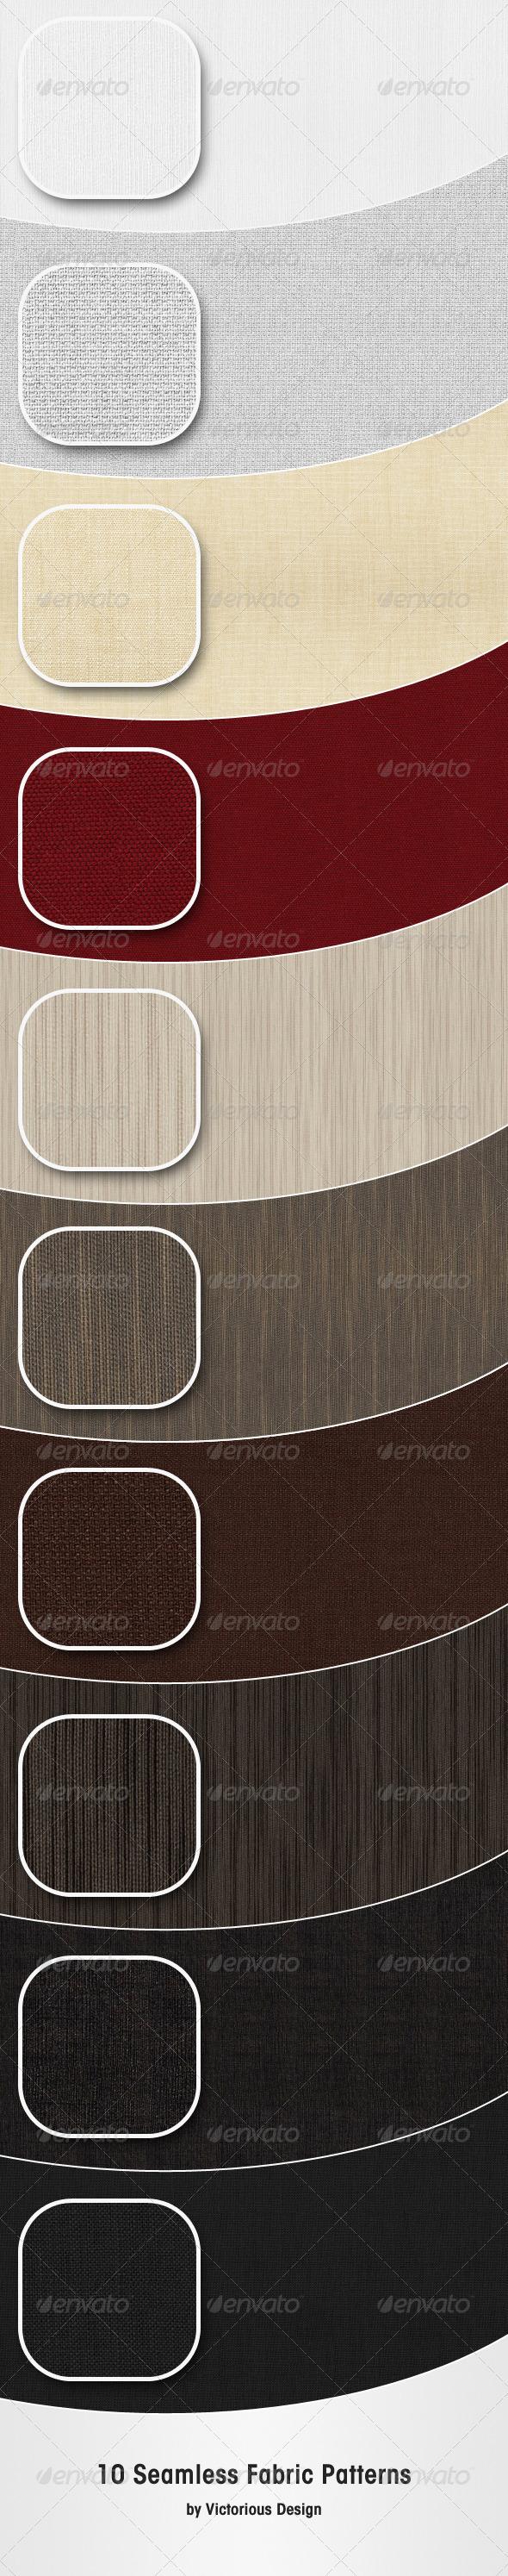 10 Seamless Fabric Patterns - Textures / Fills / Patterns Illustrator